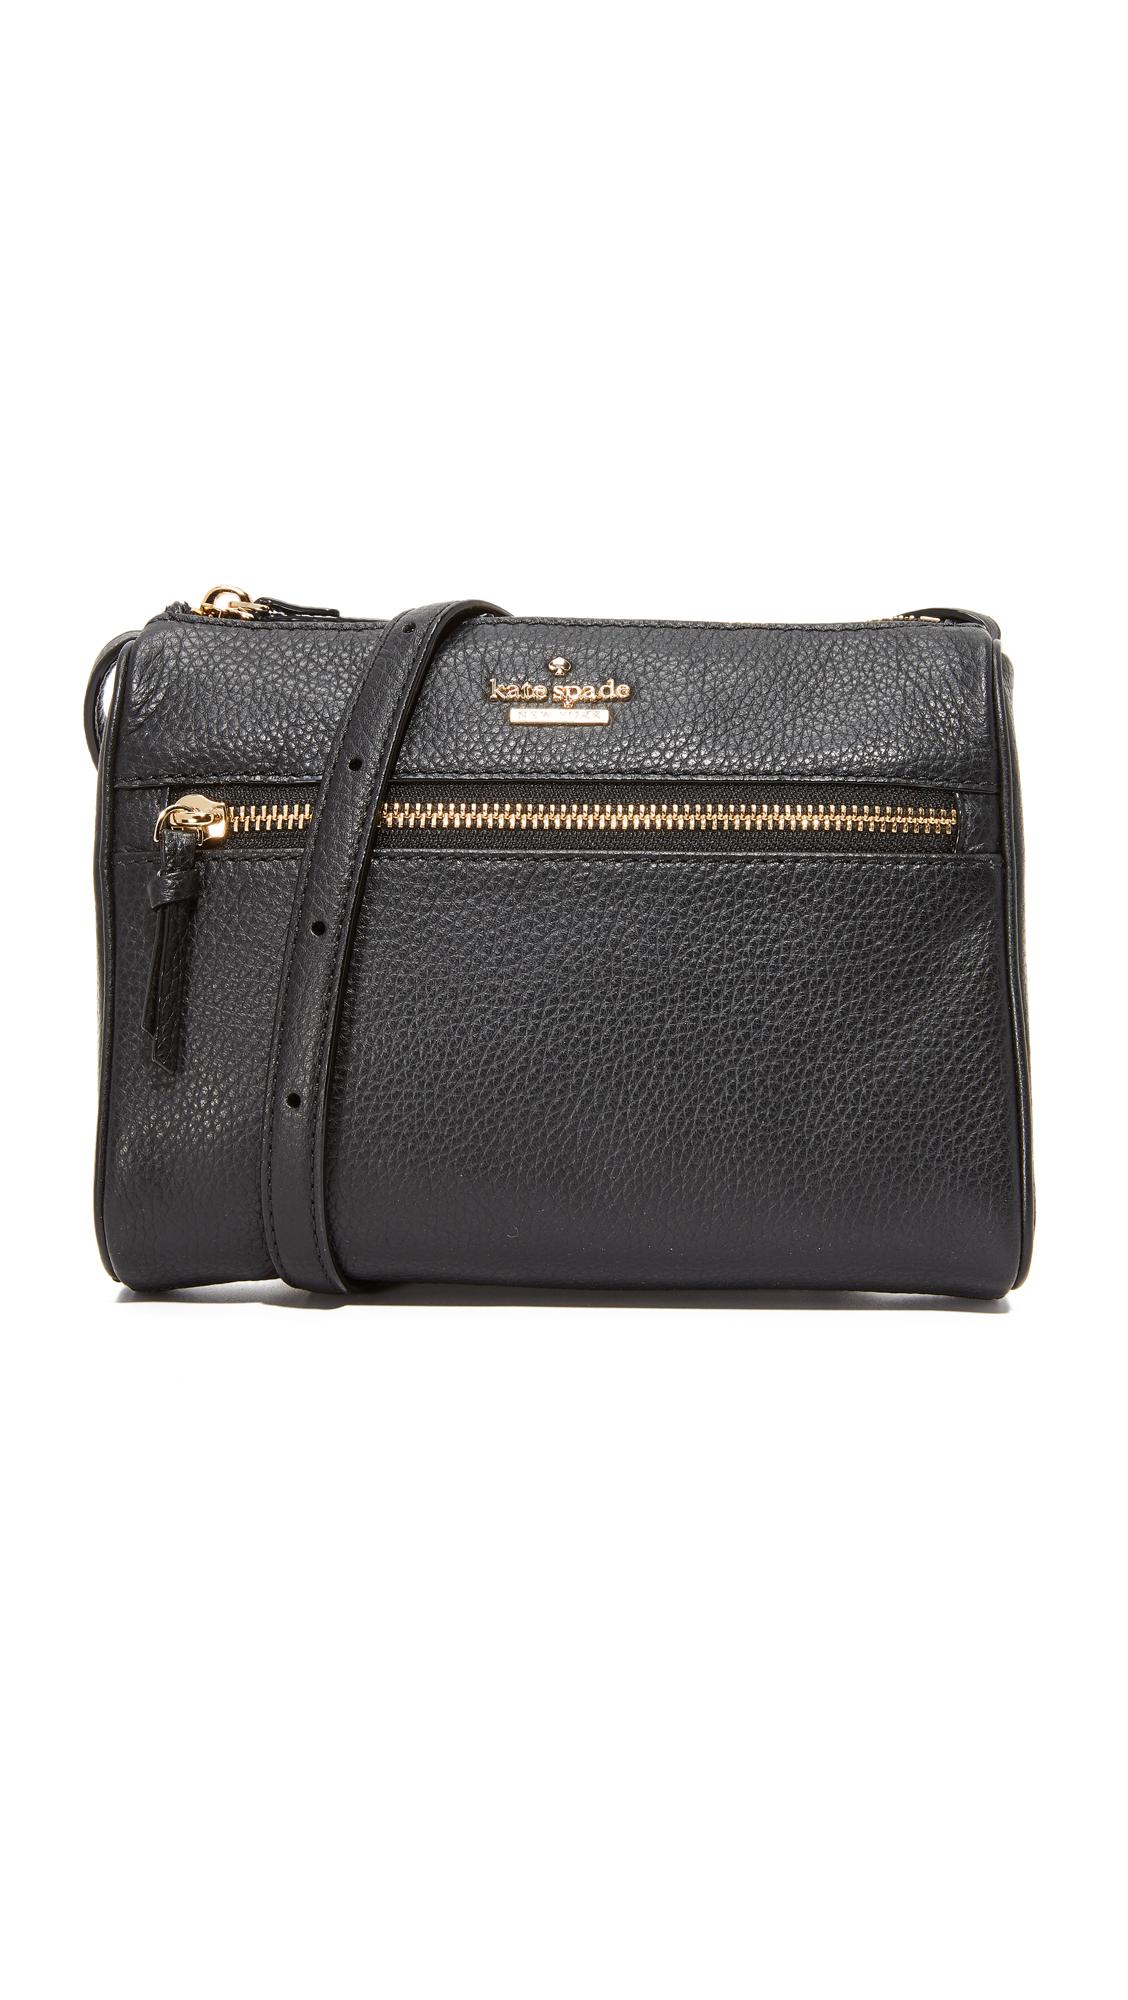 Kate Spade New York Jackson Street Mini Cayli Cross Body Bag - Black